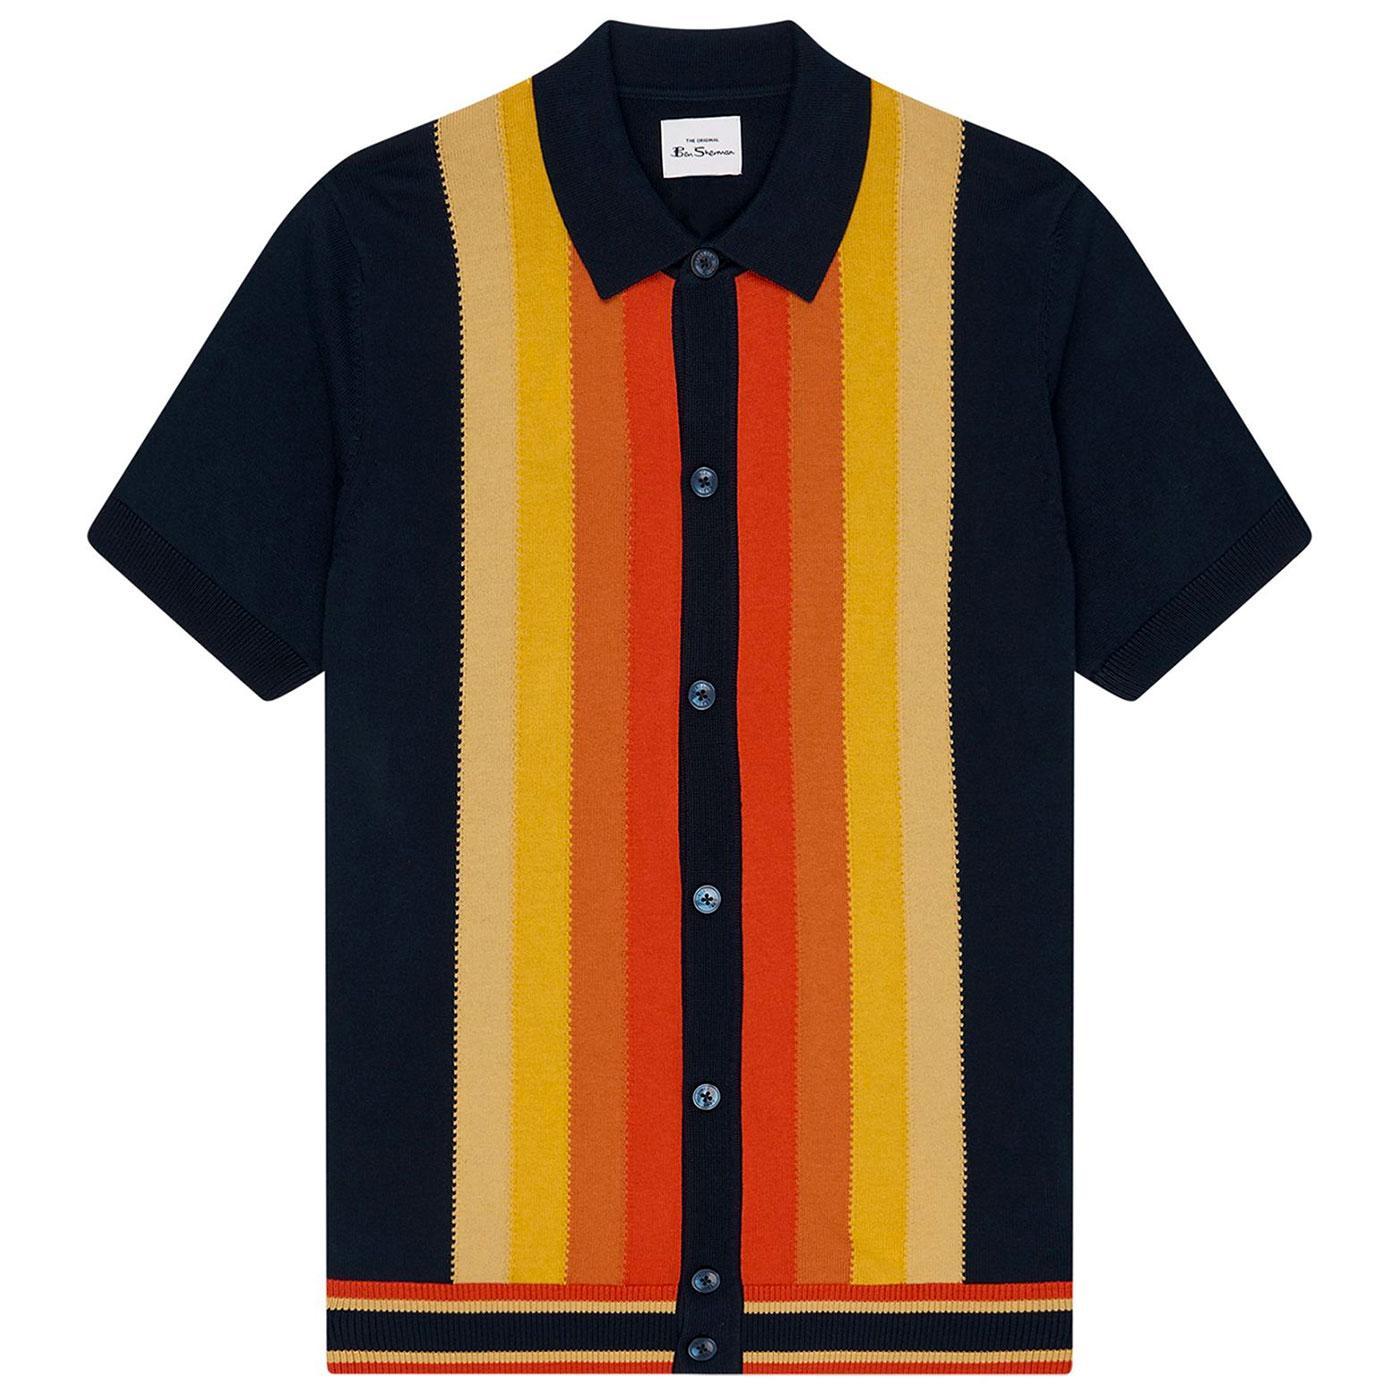 BEN SHERMAN Retro 60s Mod Gradient Polo Cardigan N